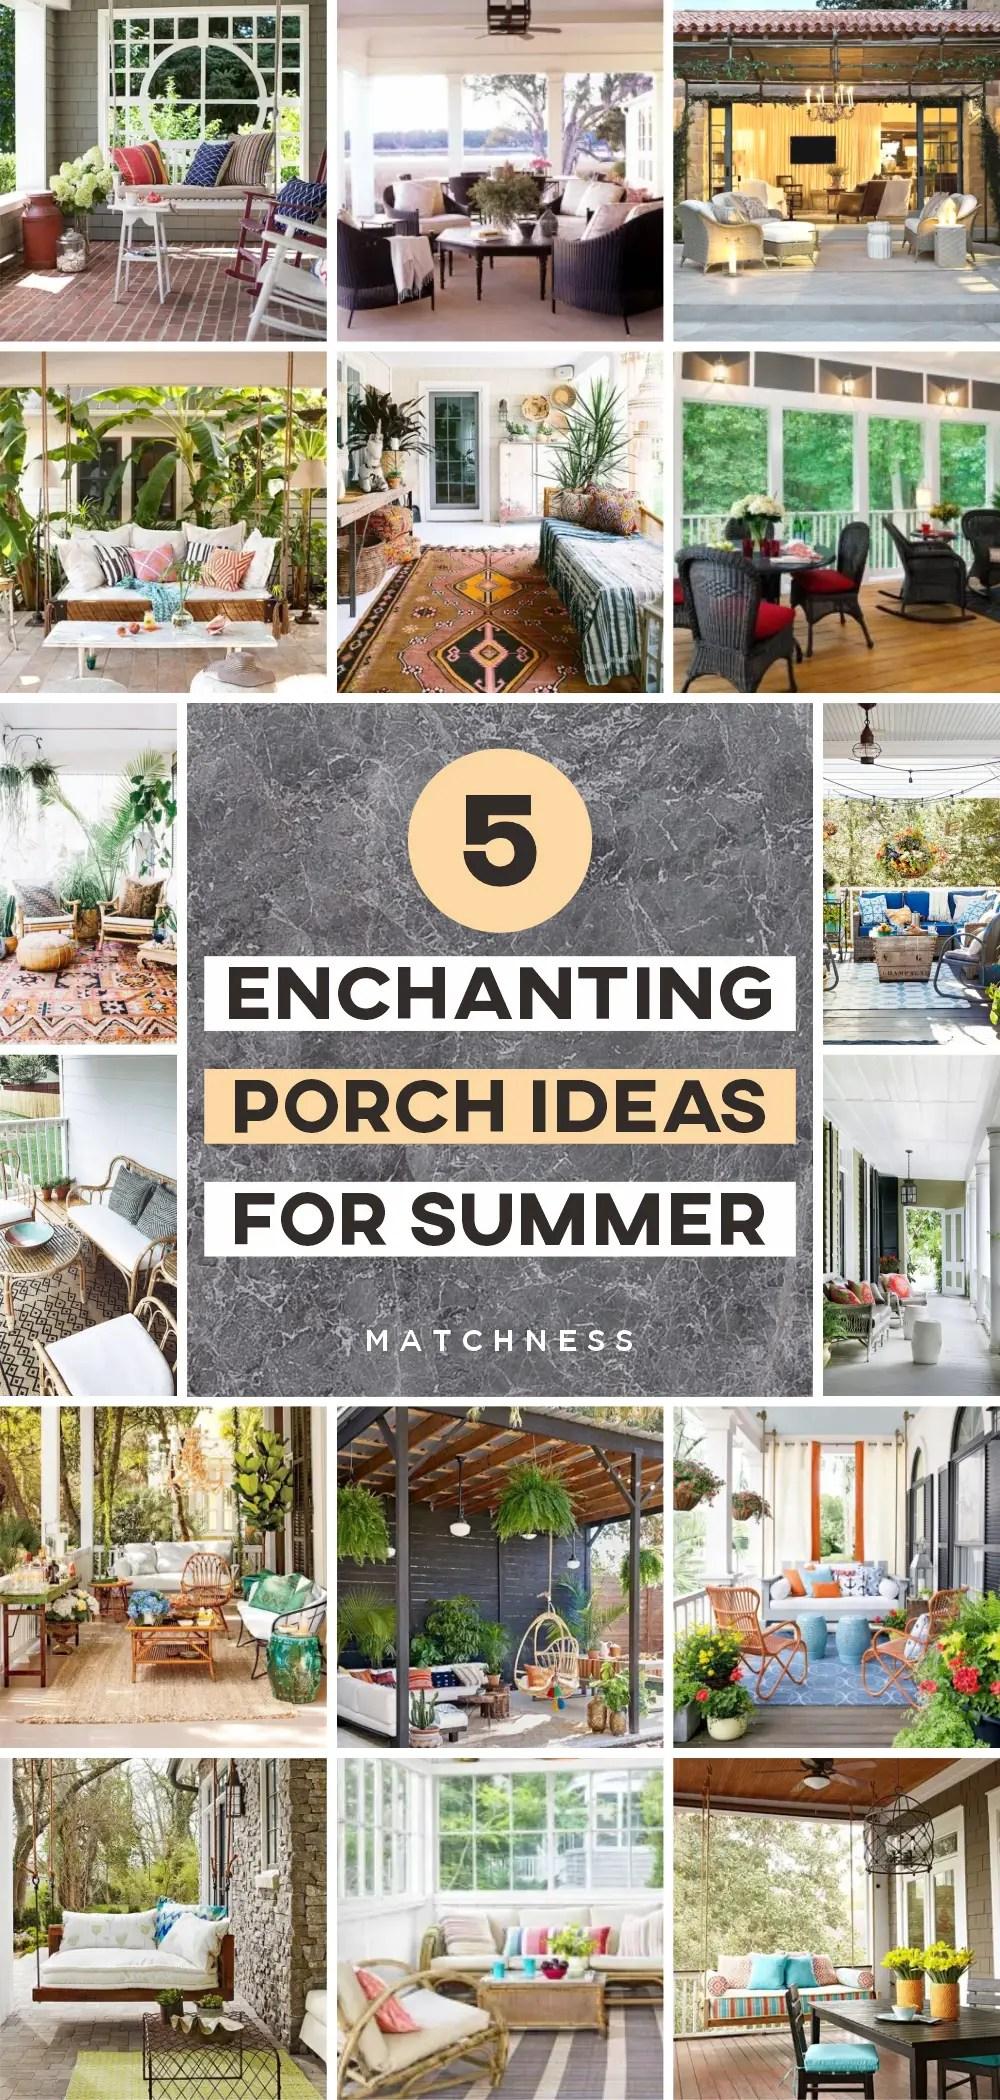 5 enchanting porch ideas for summer 1